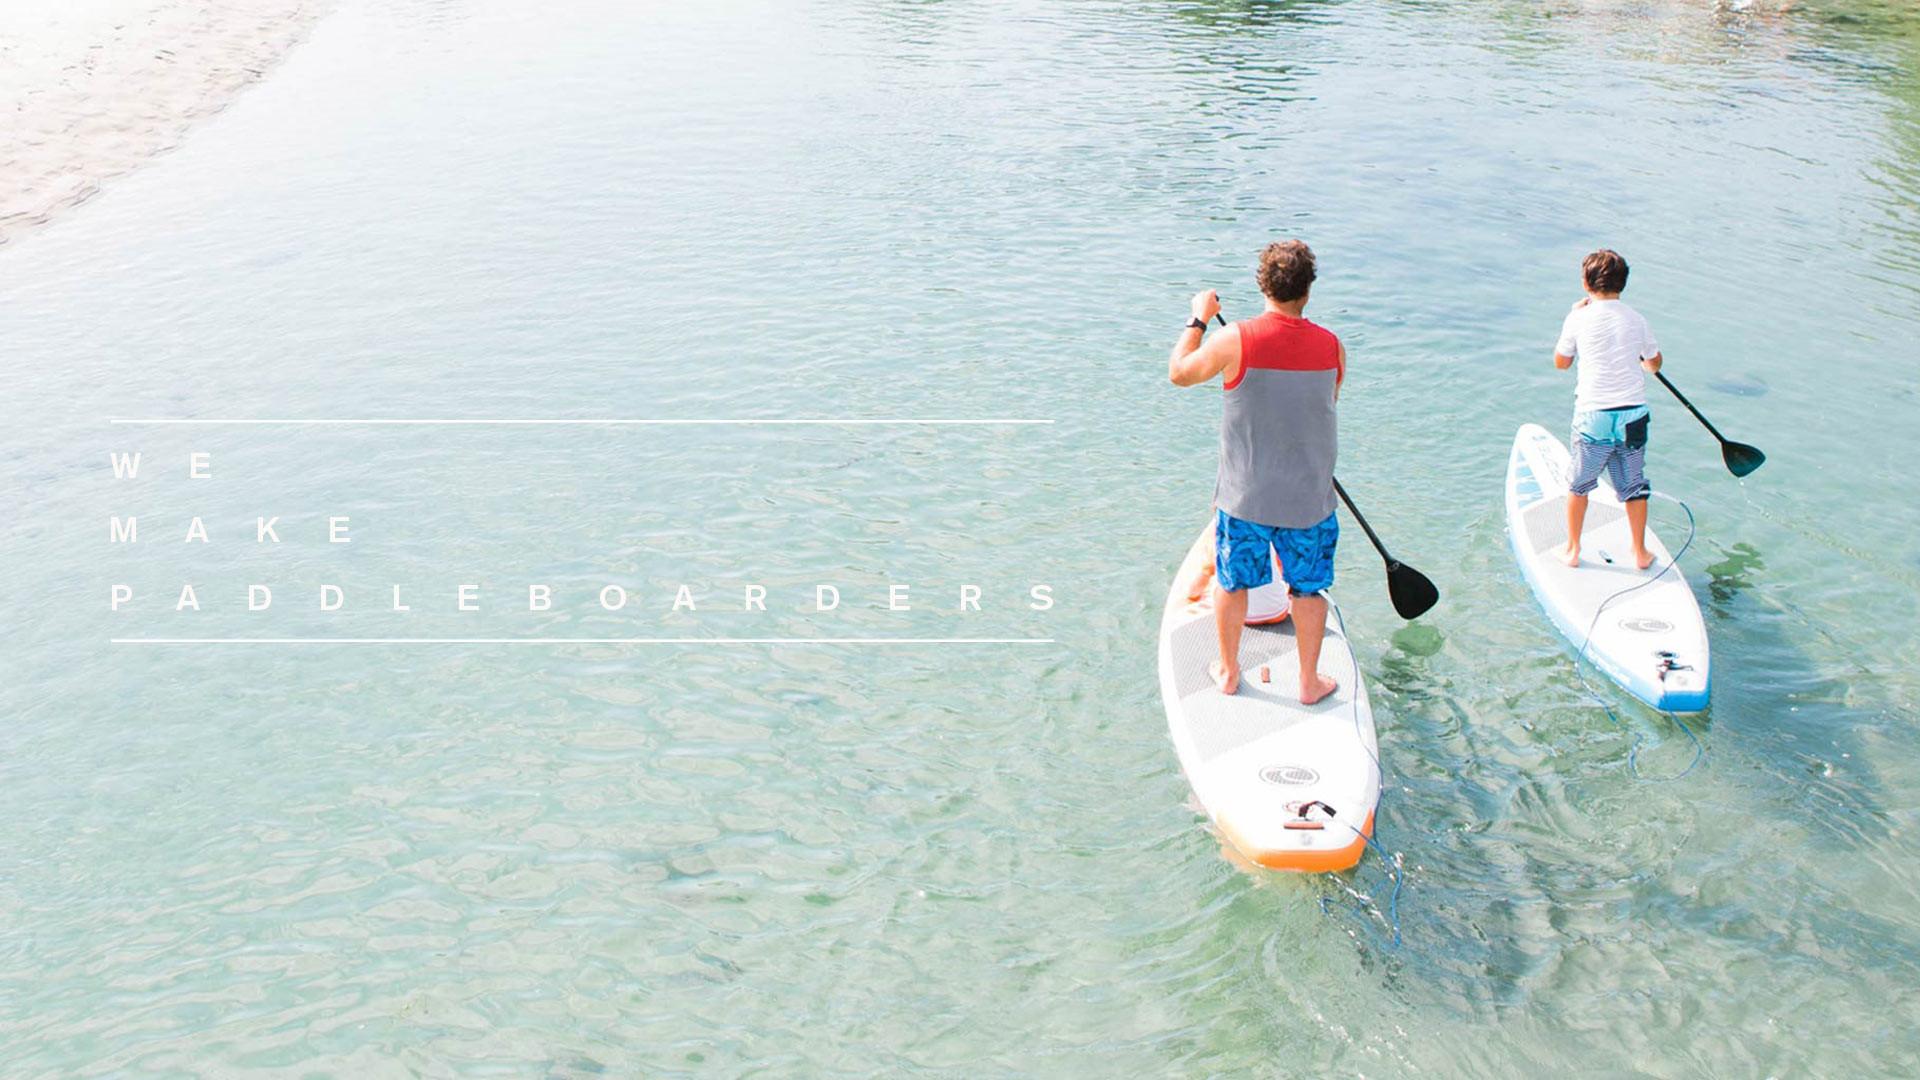 wemakepaddleboarders-mobile-1